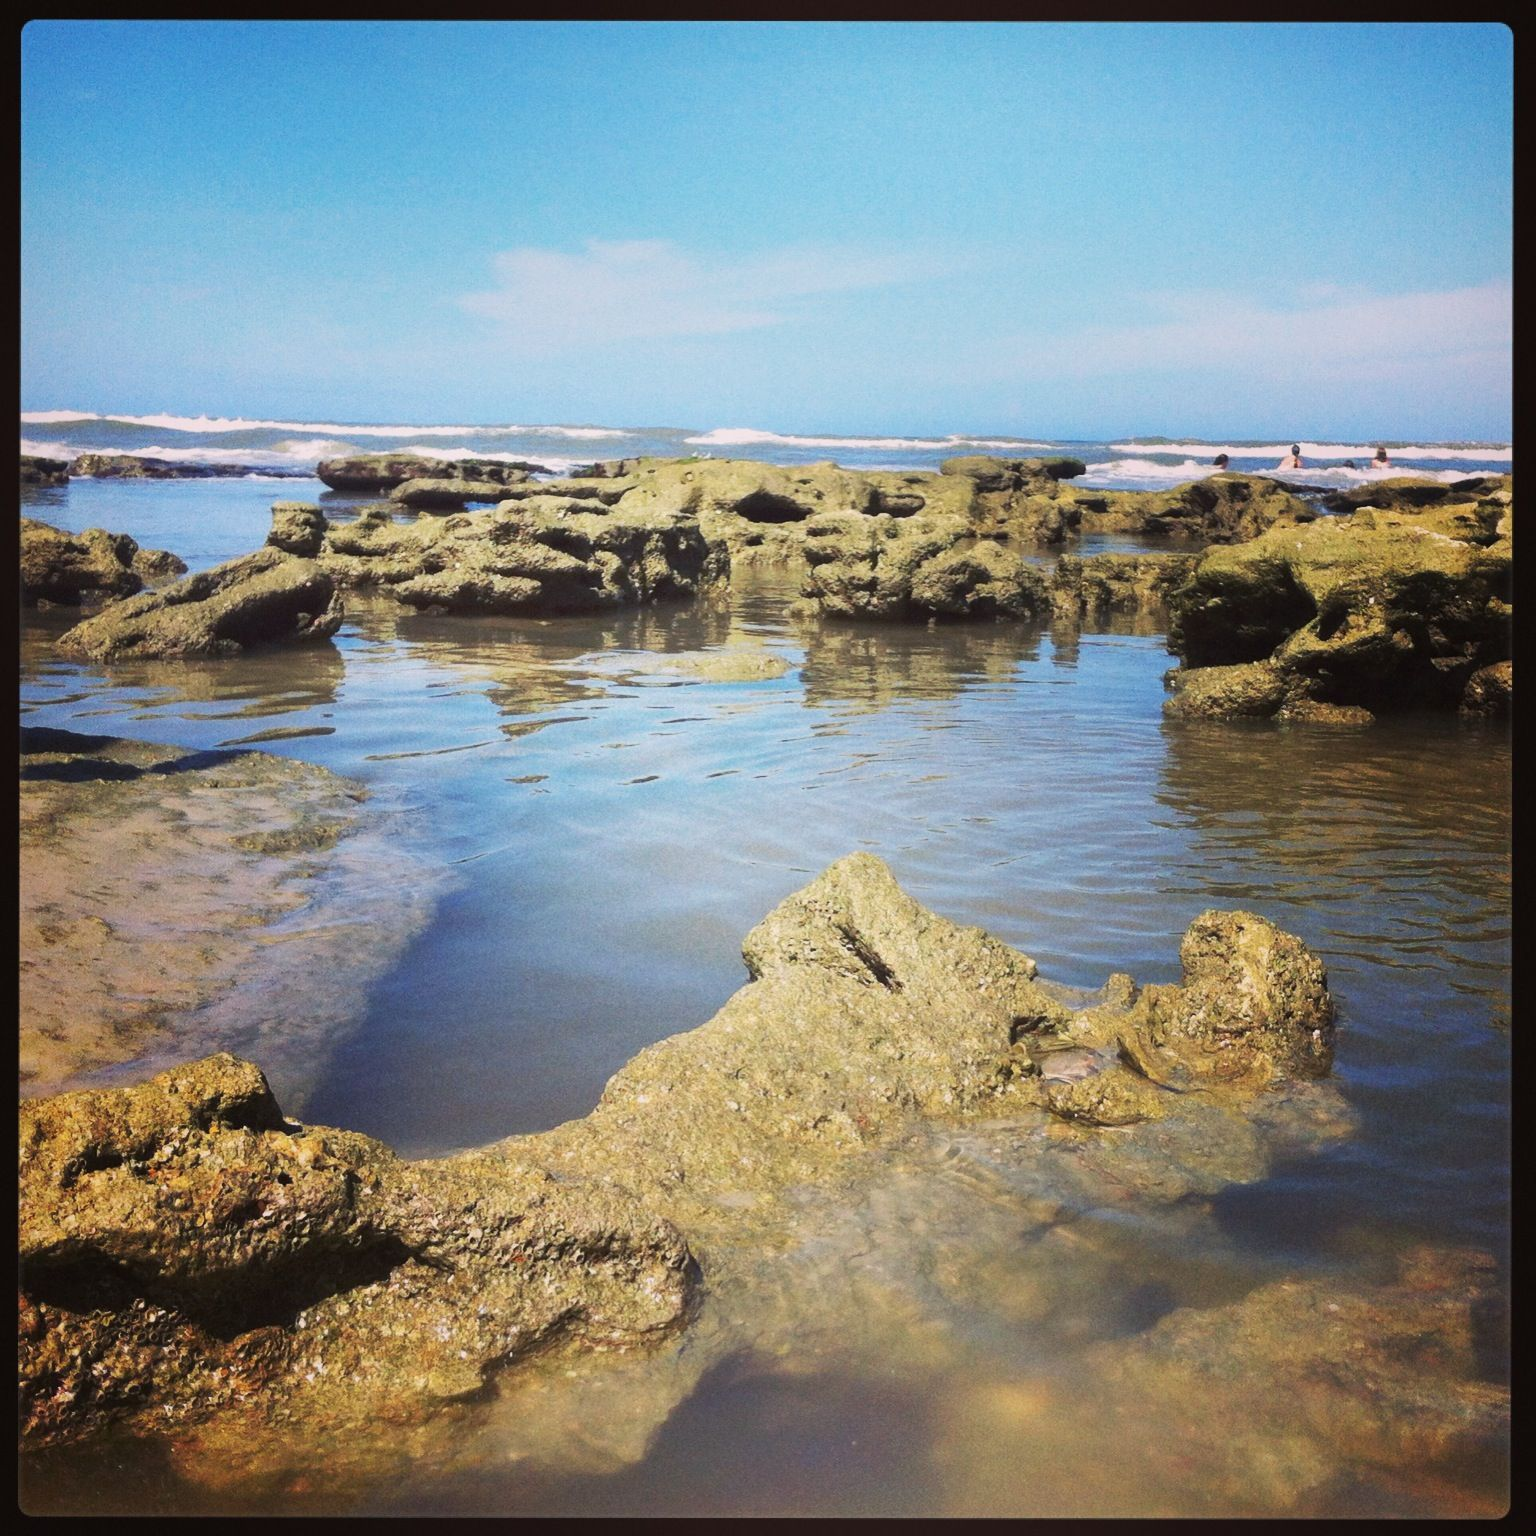 West Palm Beach In 2019: Low Tide At Cinnamon Beach, Palm Coast, Florida. In 2019